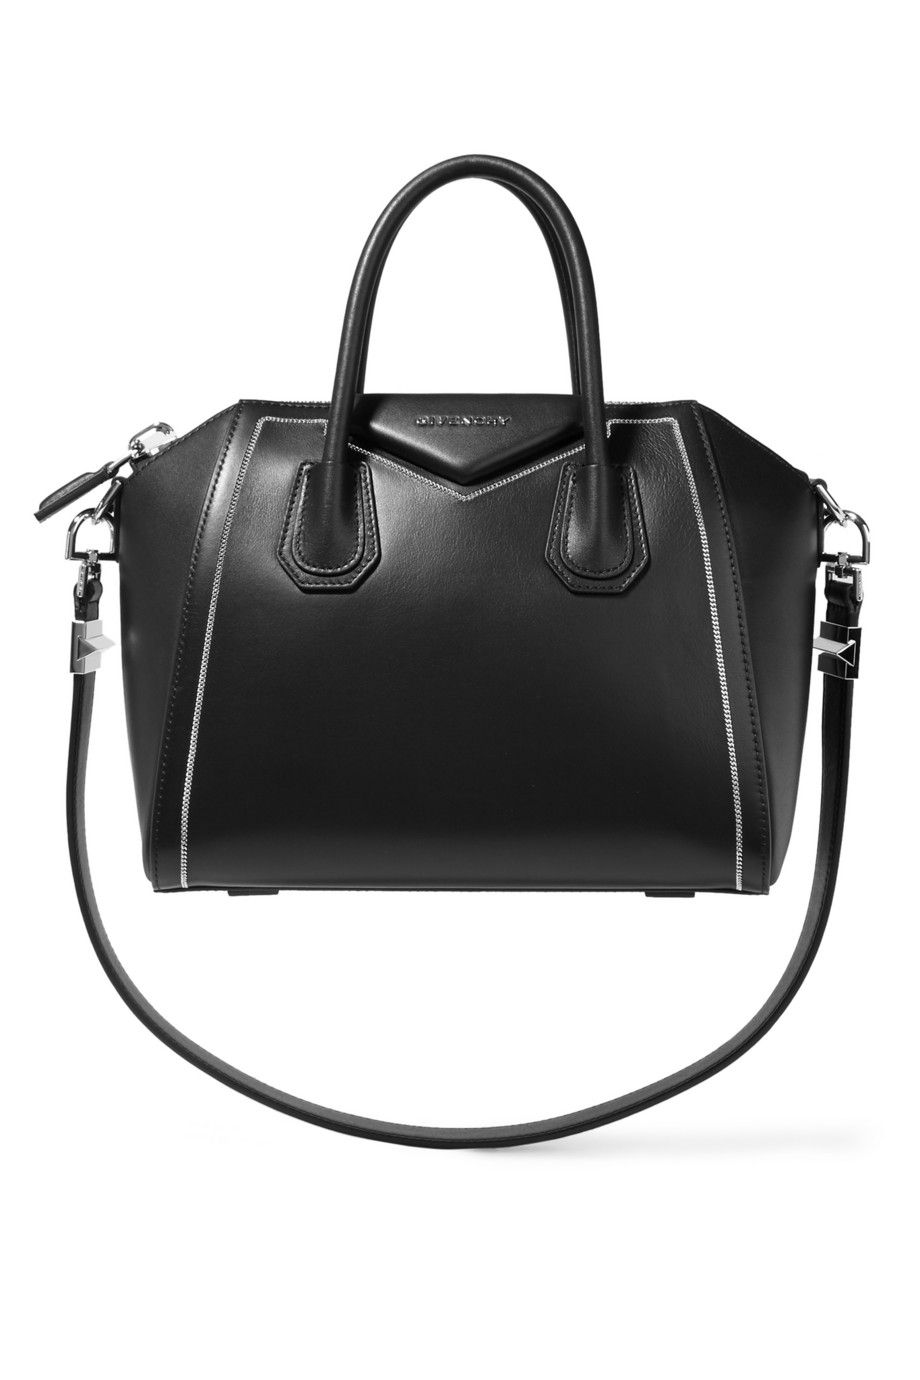 Petit Modèle GivenchySac Noir A Net Antigona En Cuir GUpqSzMVL